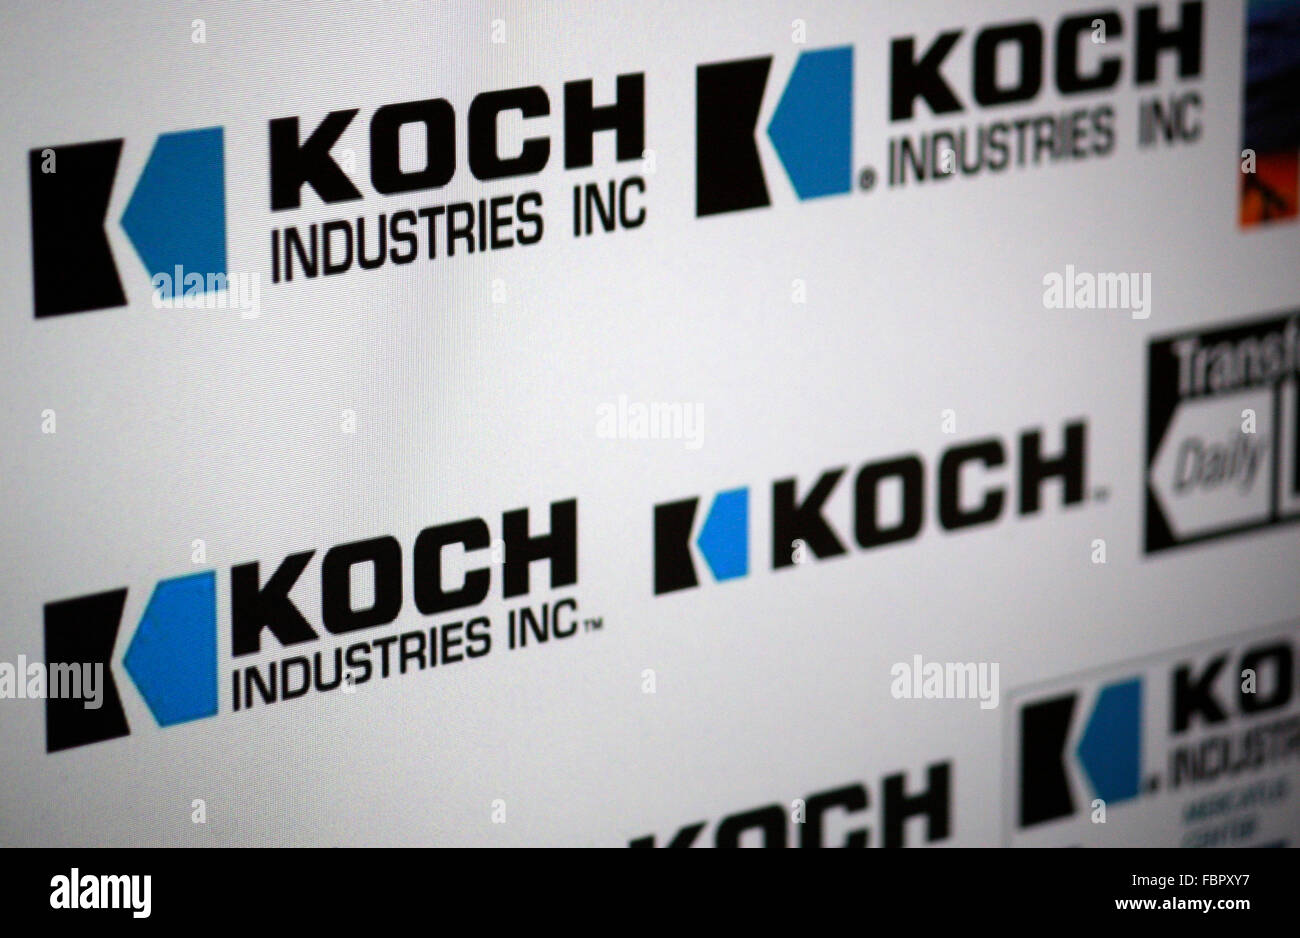 markenname koch industries stockfoto bild 93317147 alamy